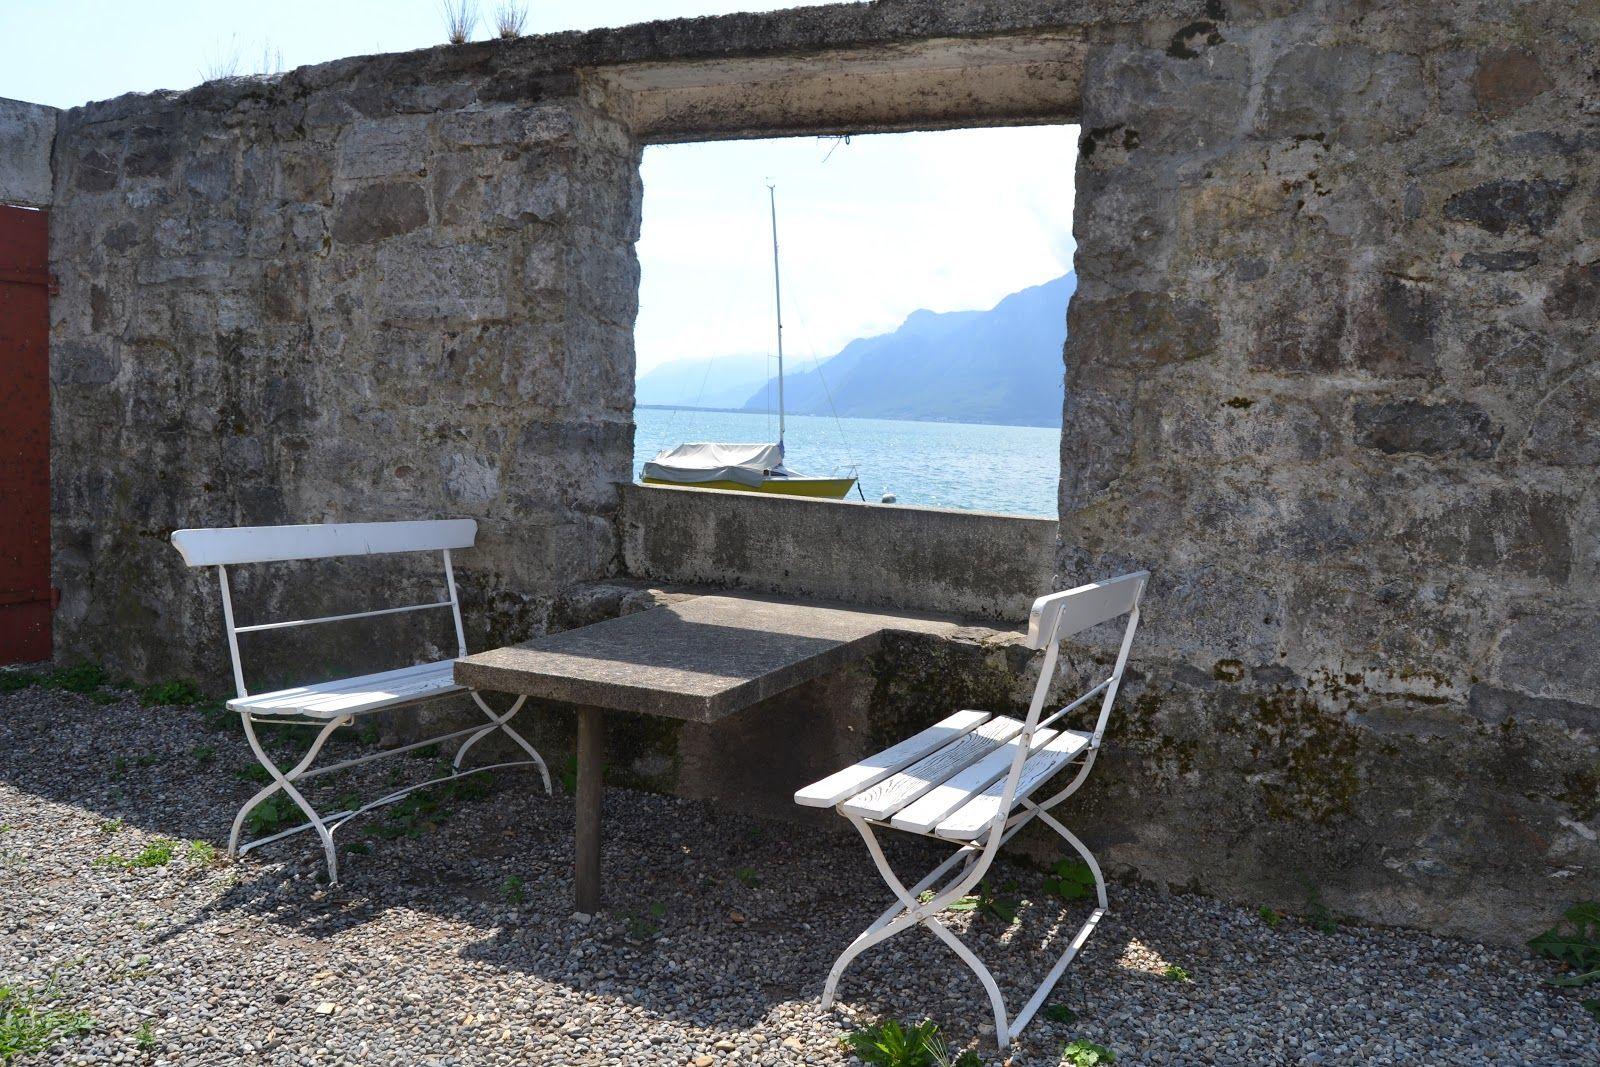 Le corbusier ville le lac arquitectura outdoor - Casas de le corbusier ...